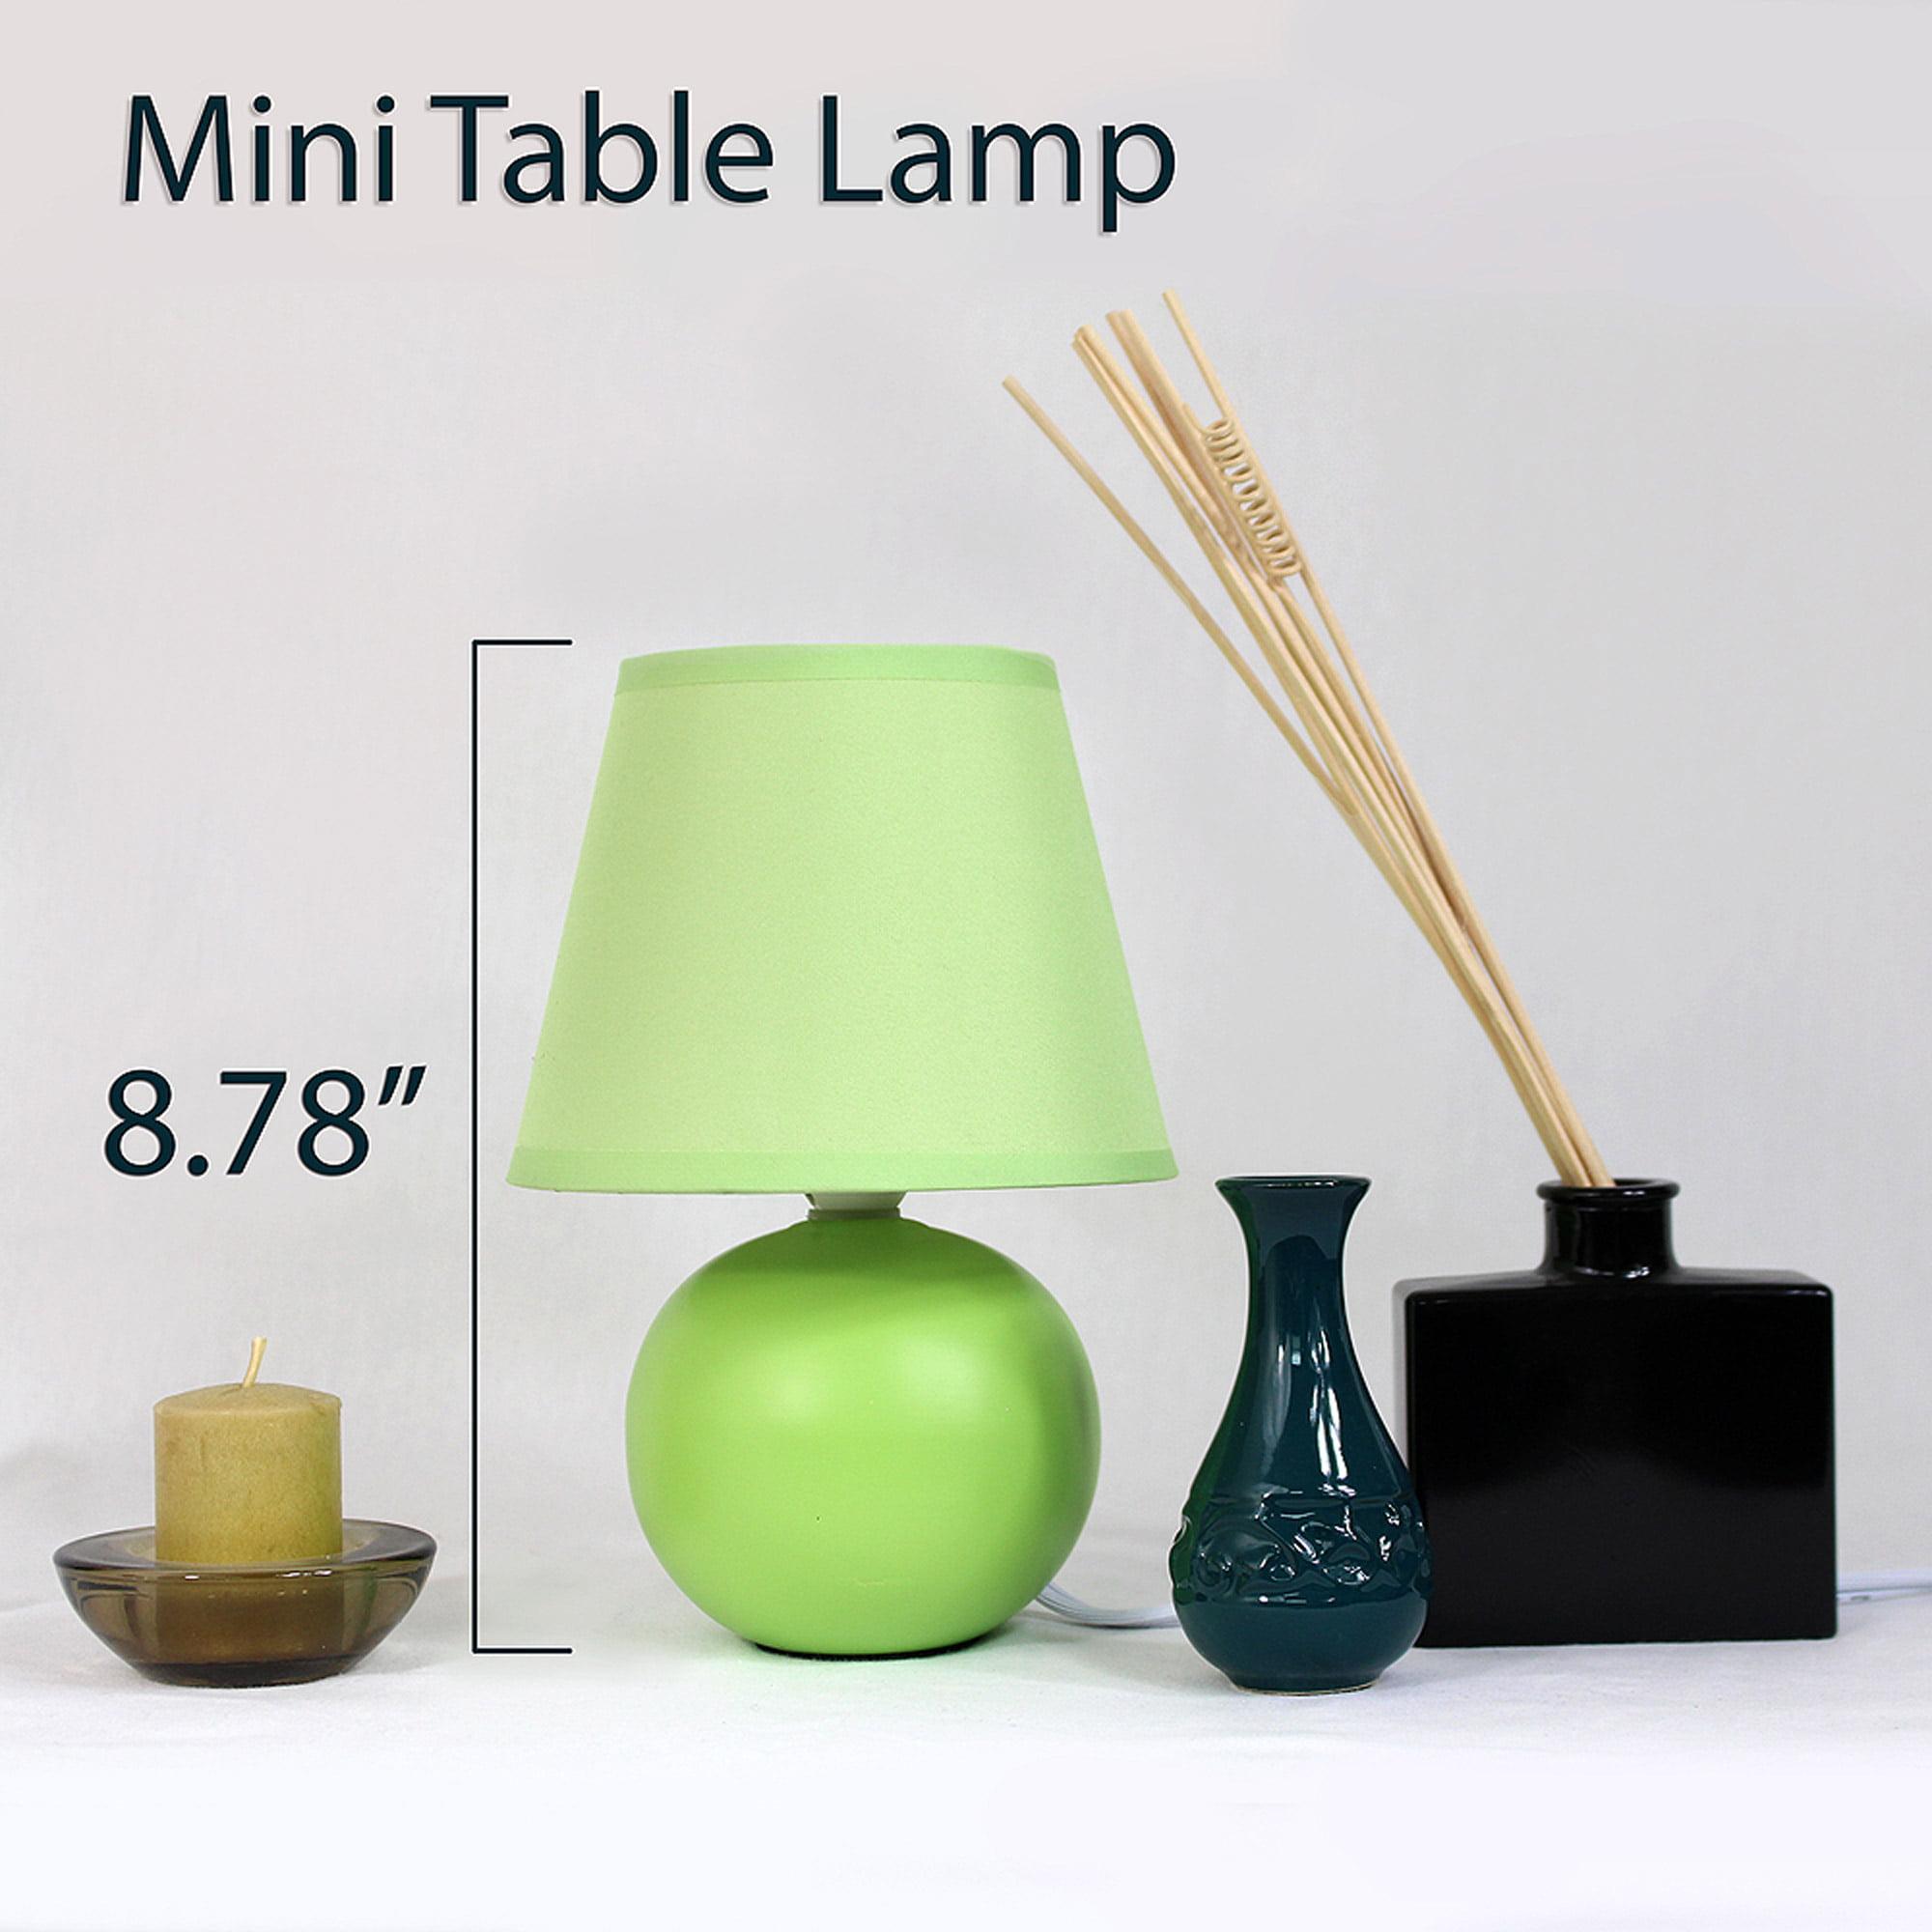 Small globe table lamp lamp design ideas simple designs mini ceramic globe table lamp com geotapseo Choice Image